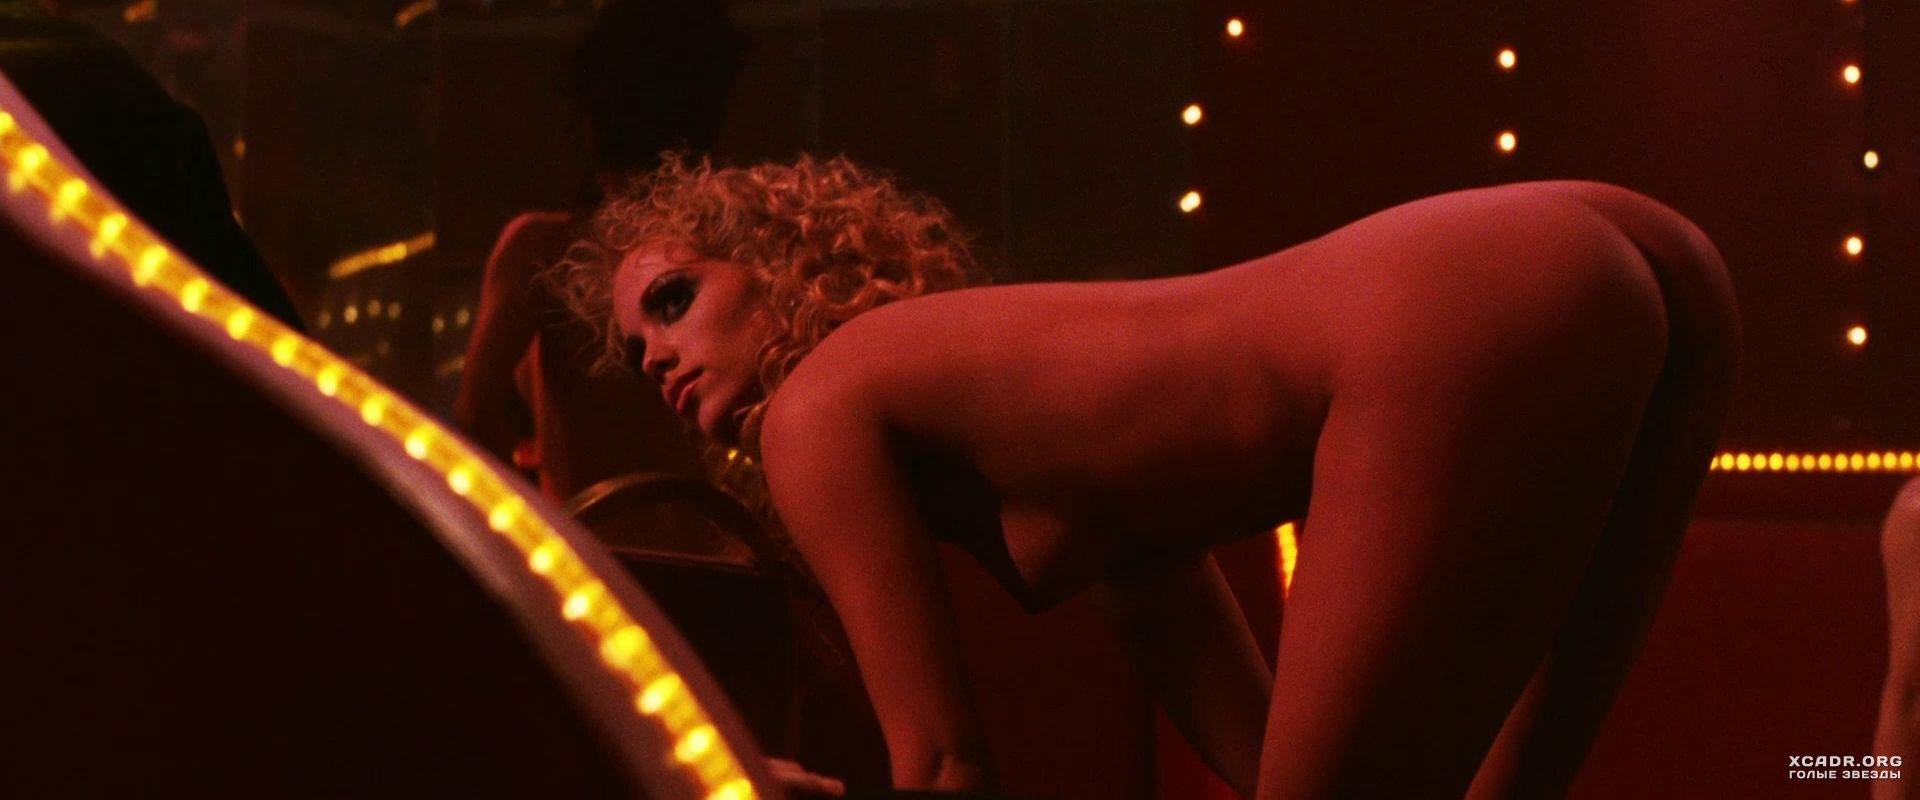 eroticheskiy-film-shou-gerlz